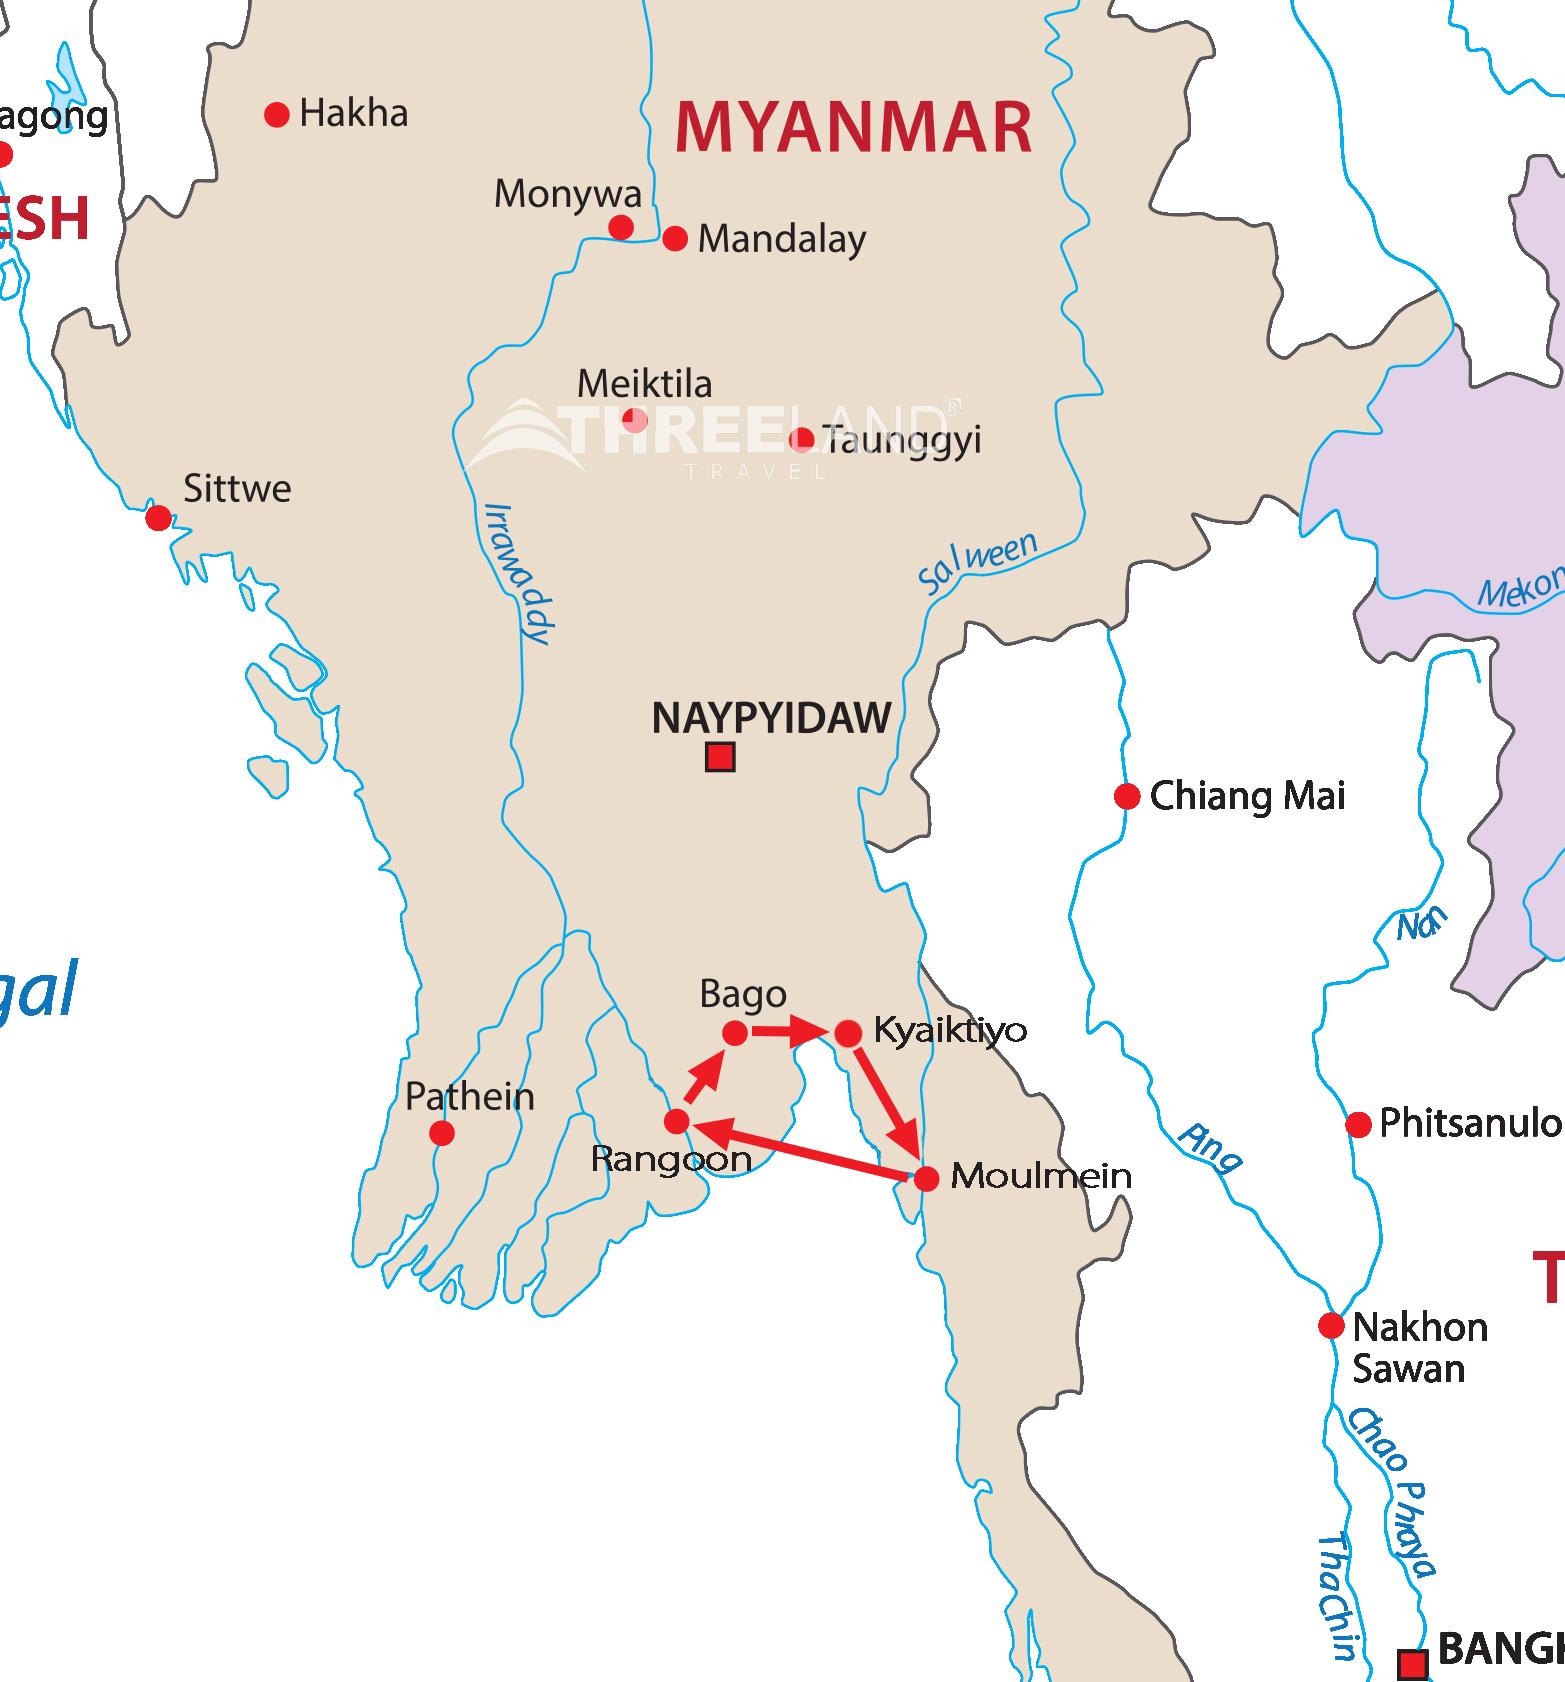 Southern Myanmar exploration